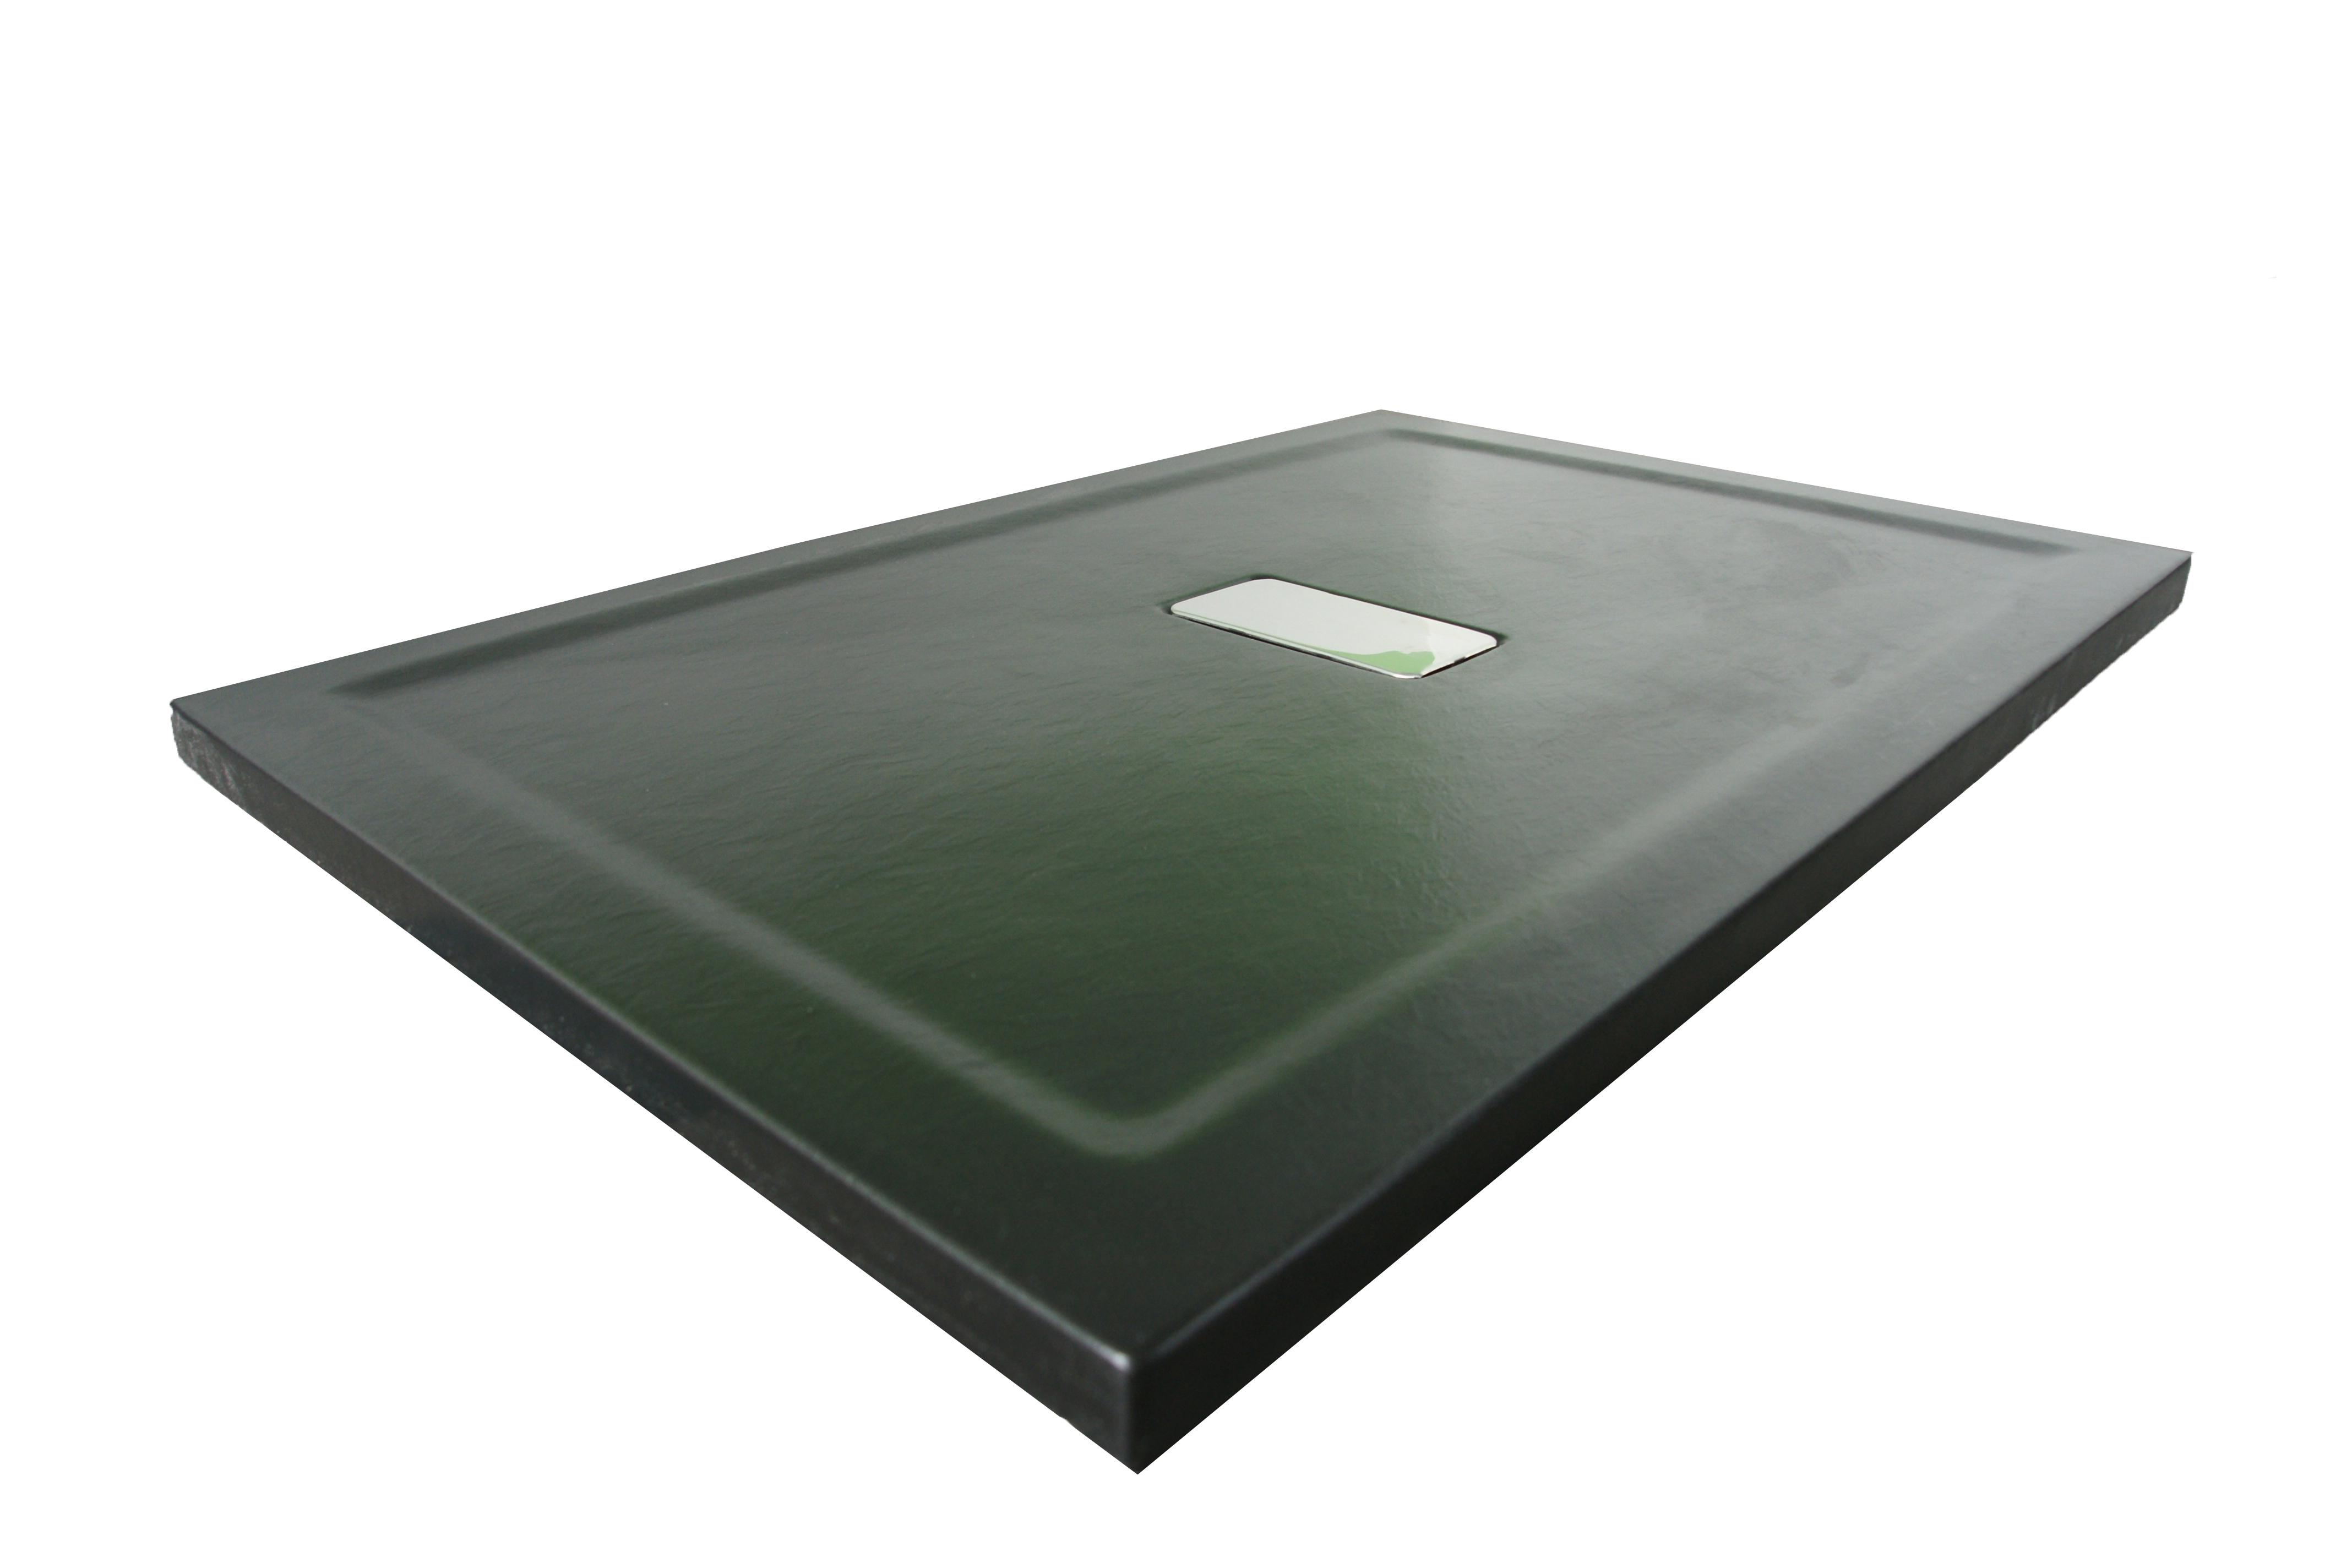 Cadita de dus Relax 170x70 - finisaj texturat negru mat1